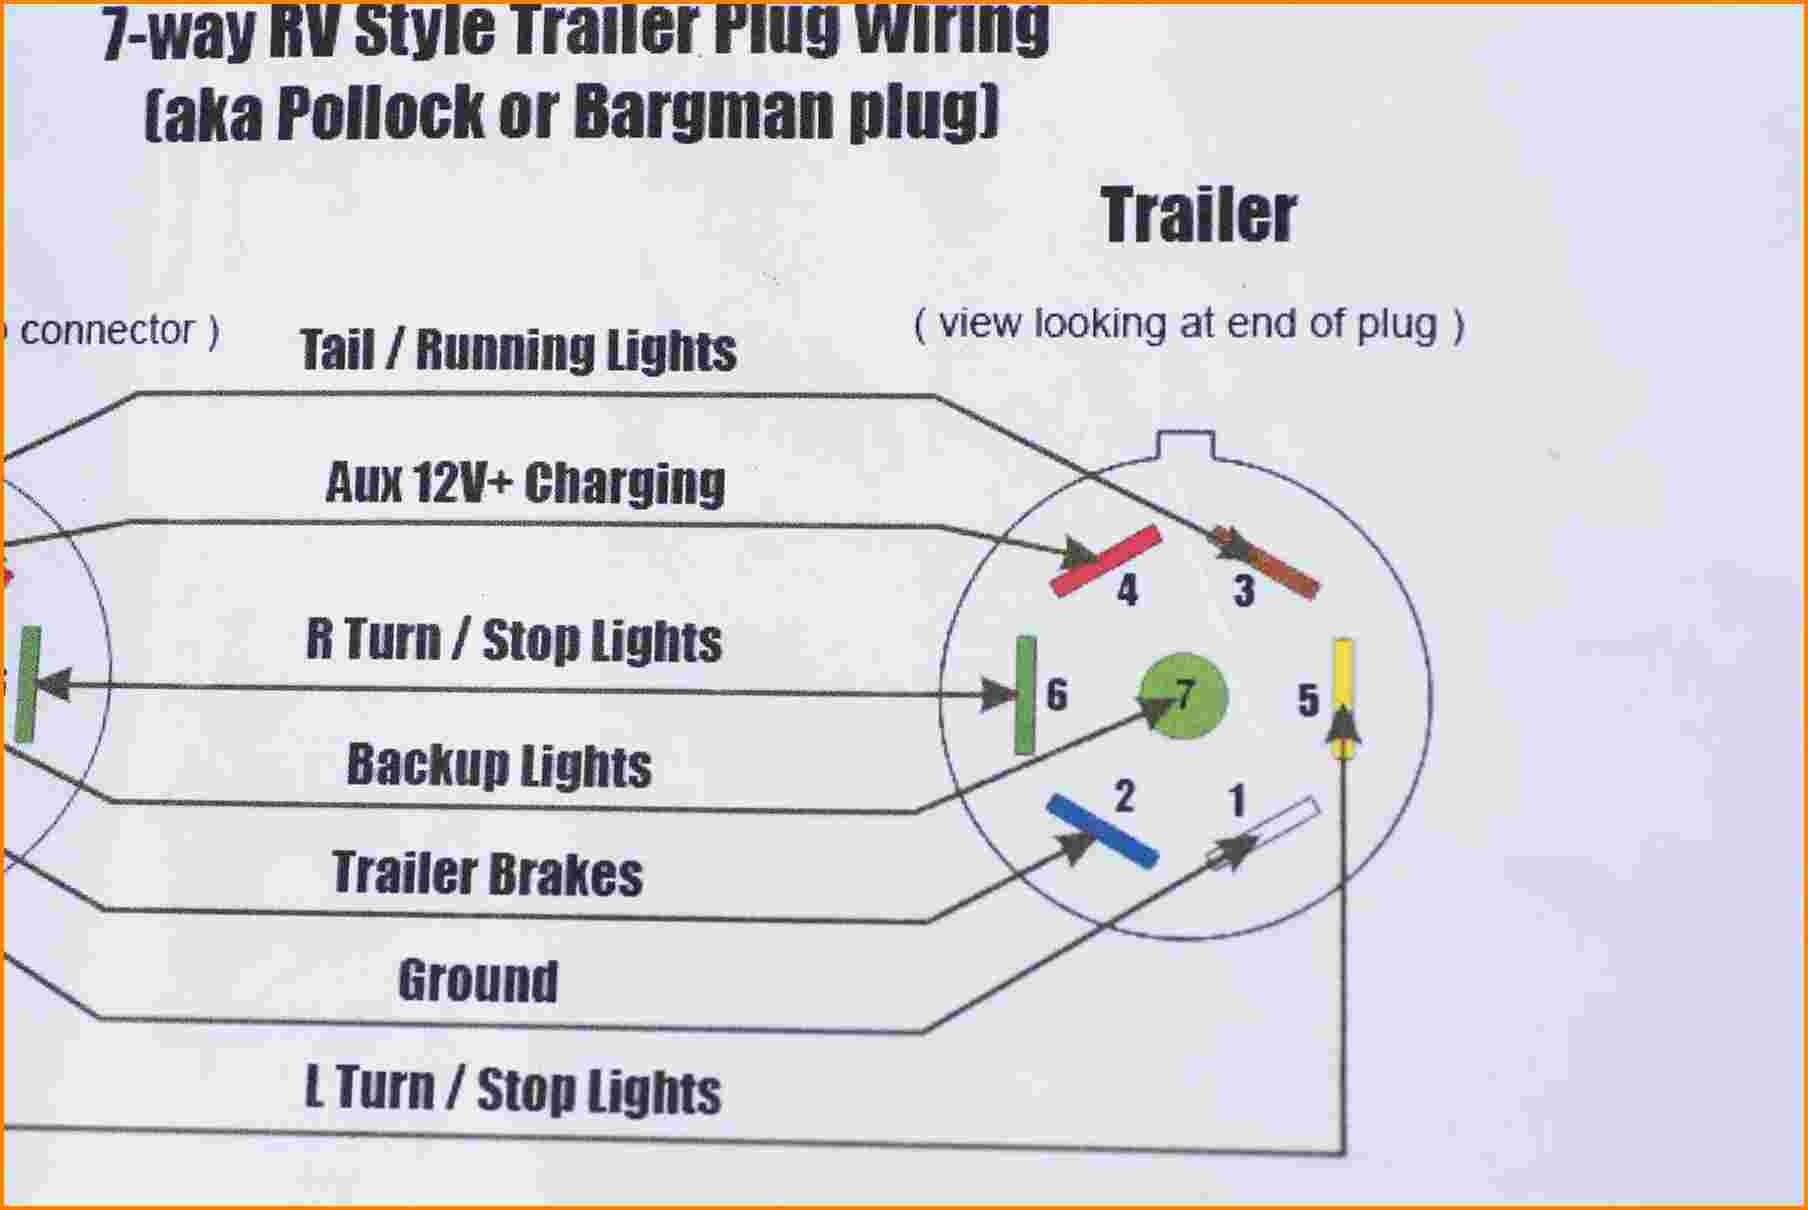 mainetreasurechest com wp content uploads 2018 07 rh mainetreasurechest com 6-pole square trailer wiring diagram 6 pin trailer wiring diagram